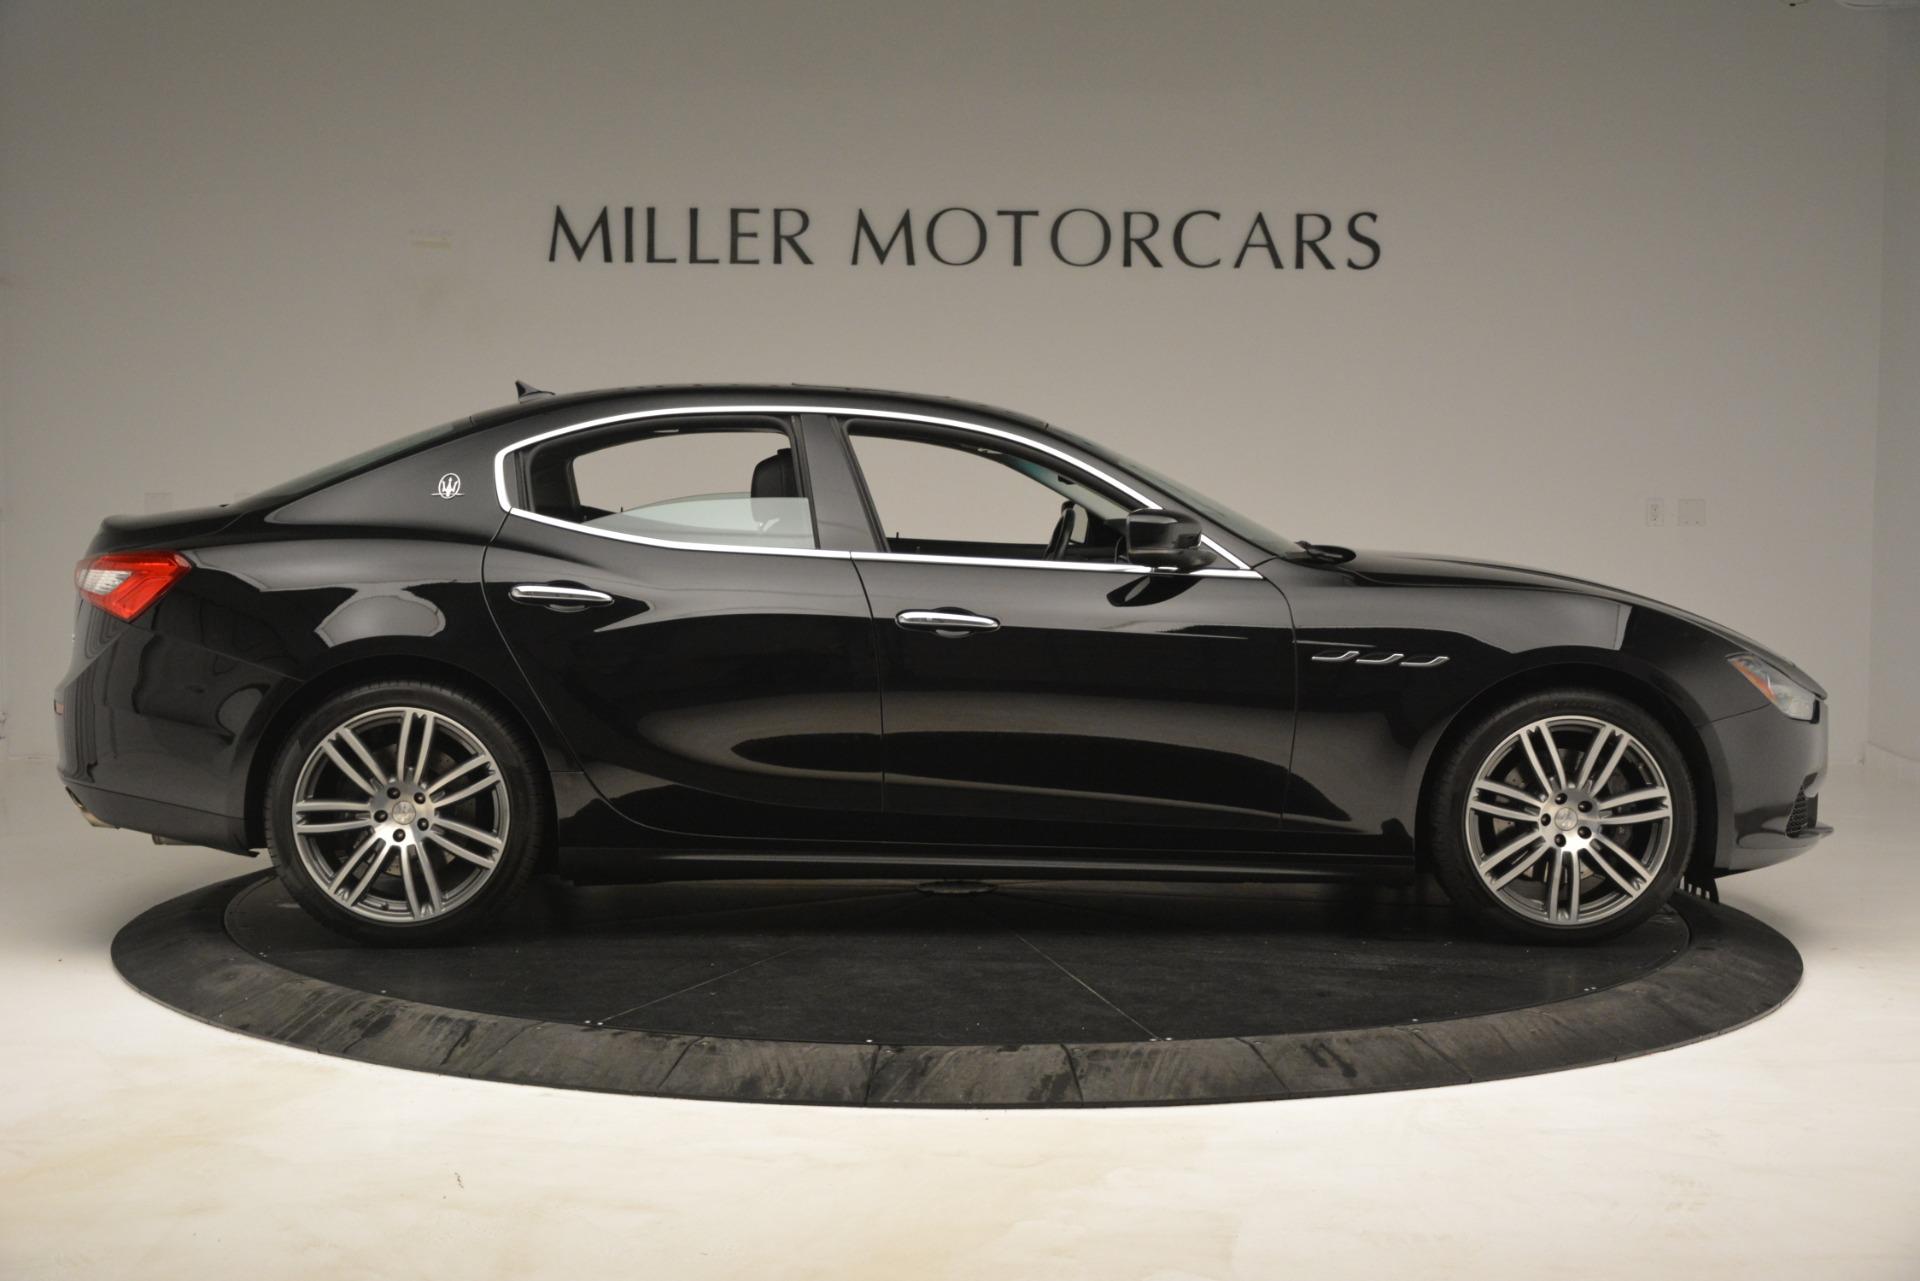 Used 2015 Maserati Ghibli S Q4 For Sale In Greenwich, CT 3102_p9